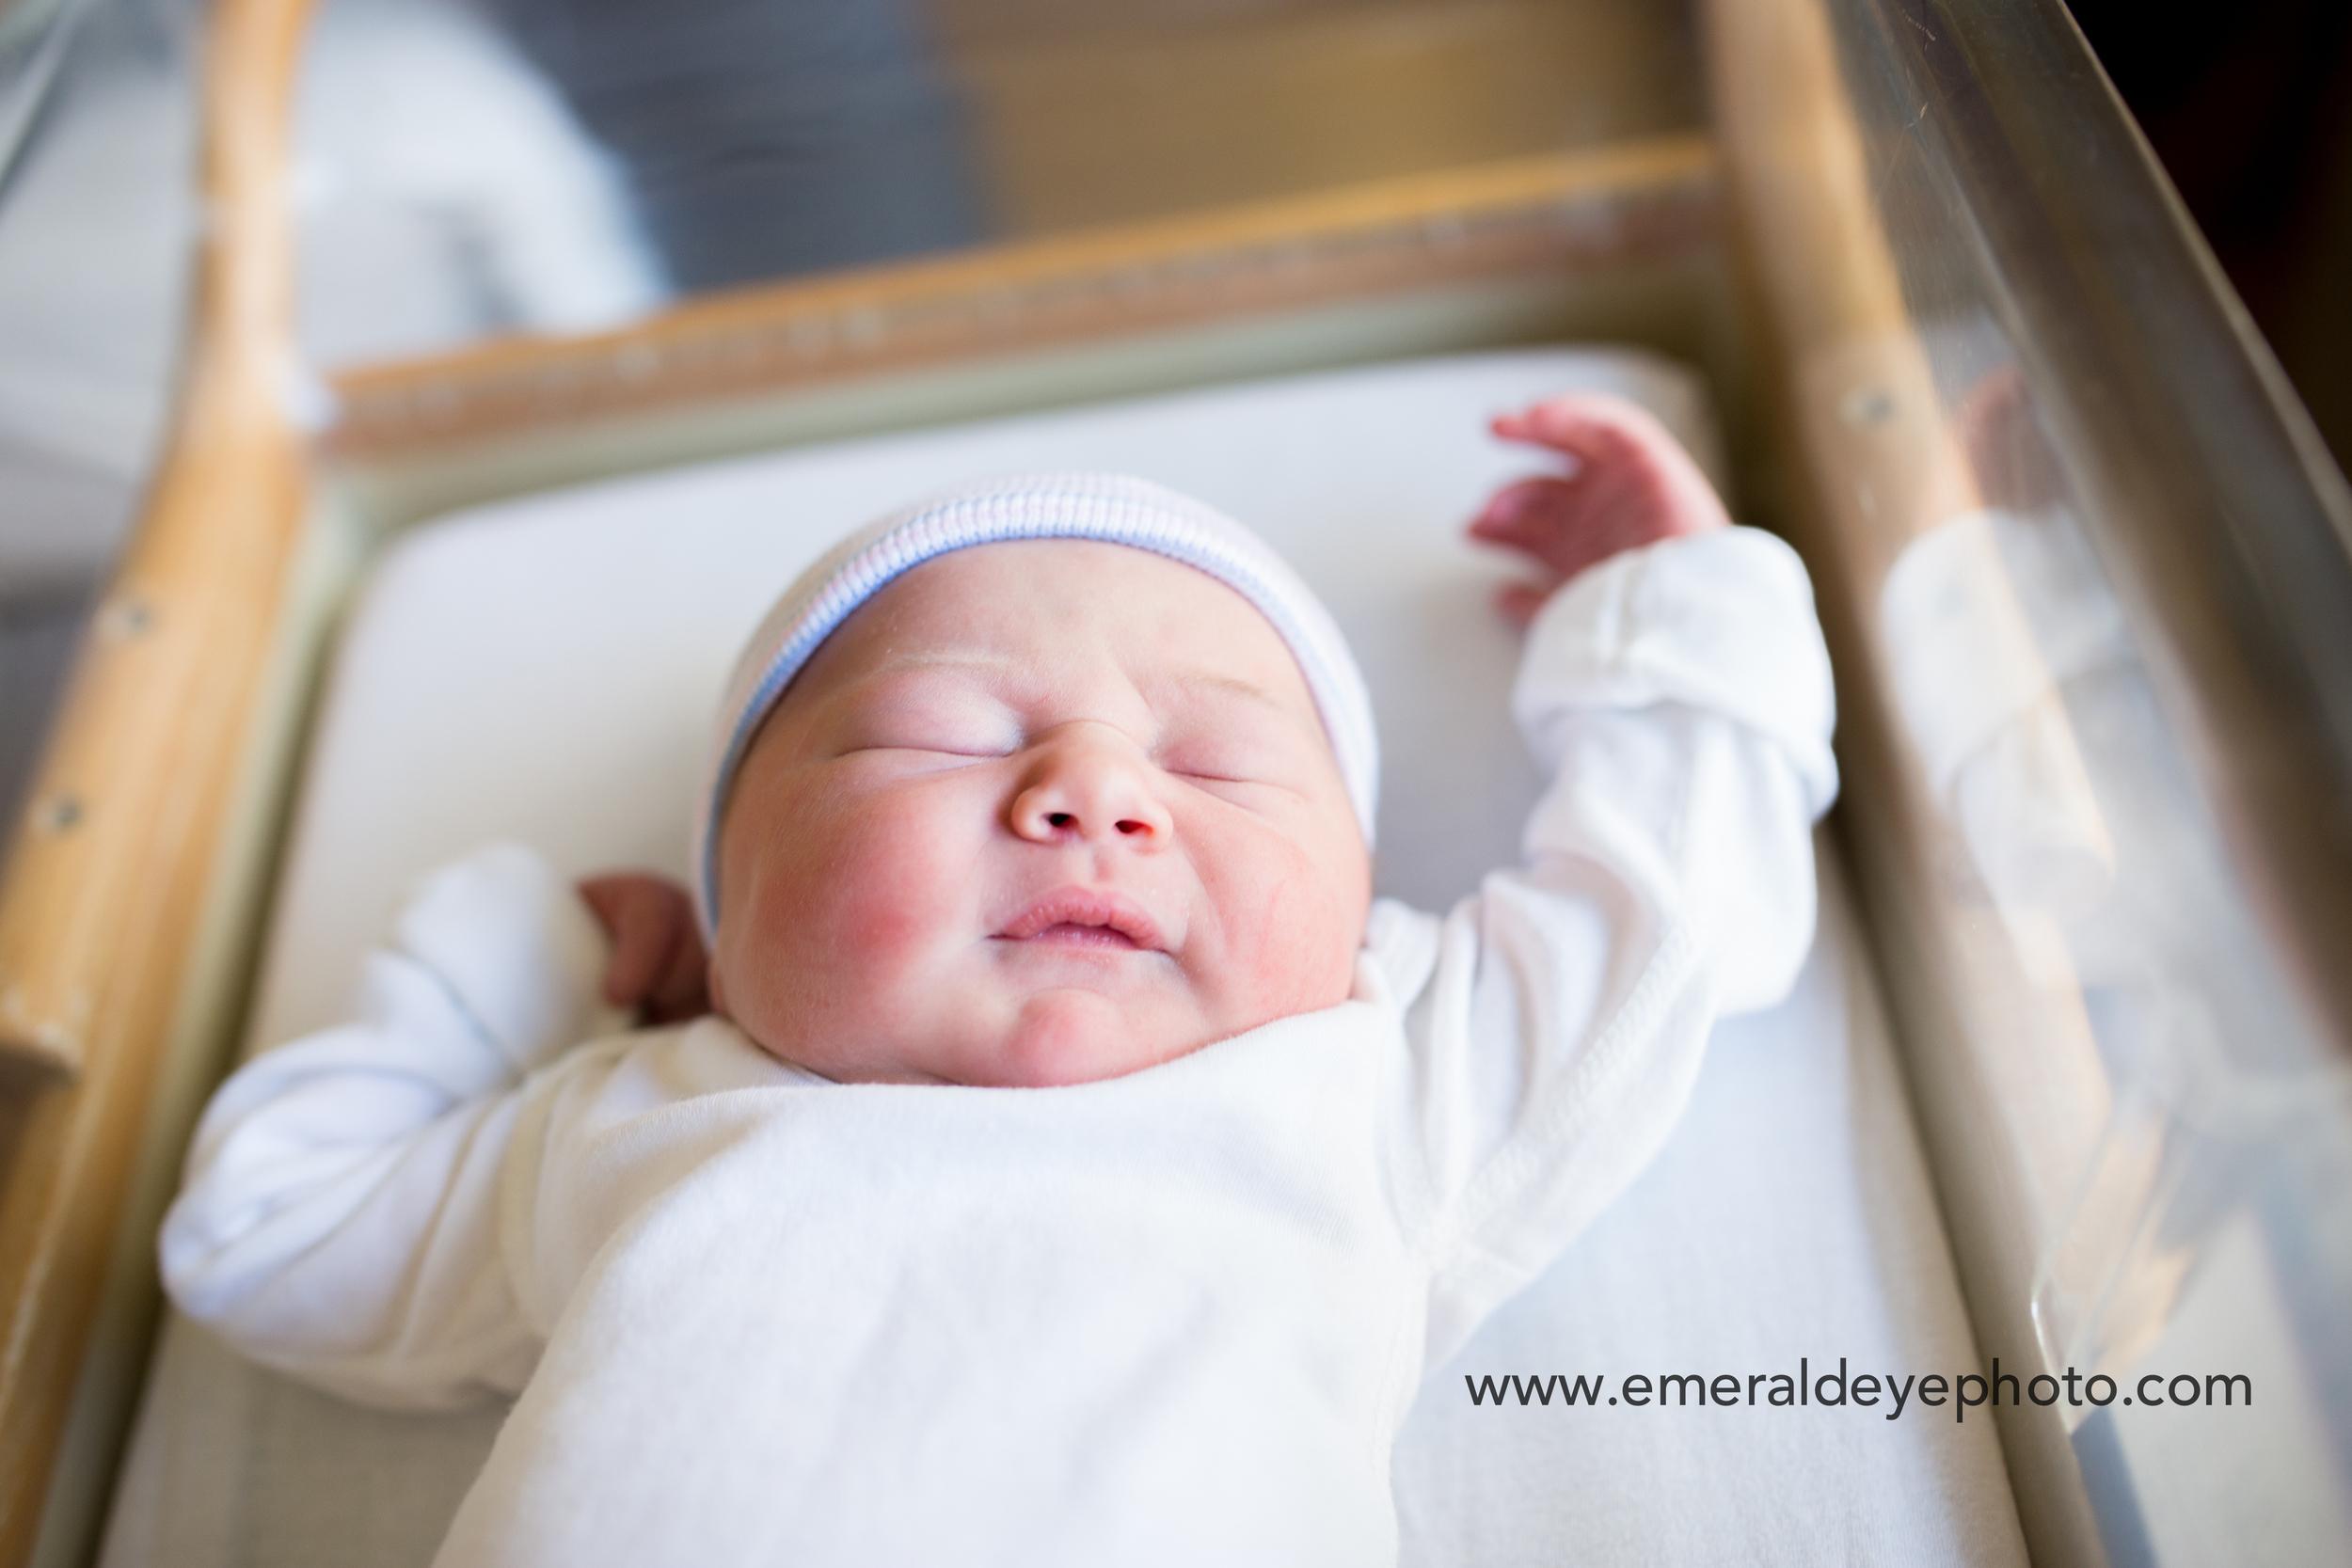 Newborn baby in bassinet in Falmouth Hospital, Massachusetts